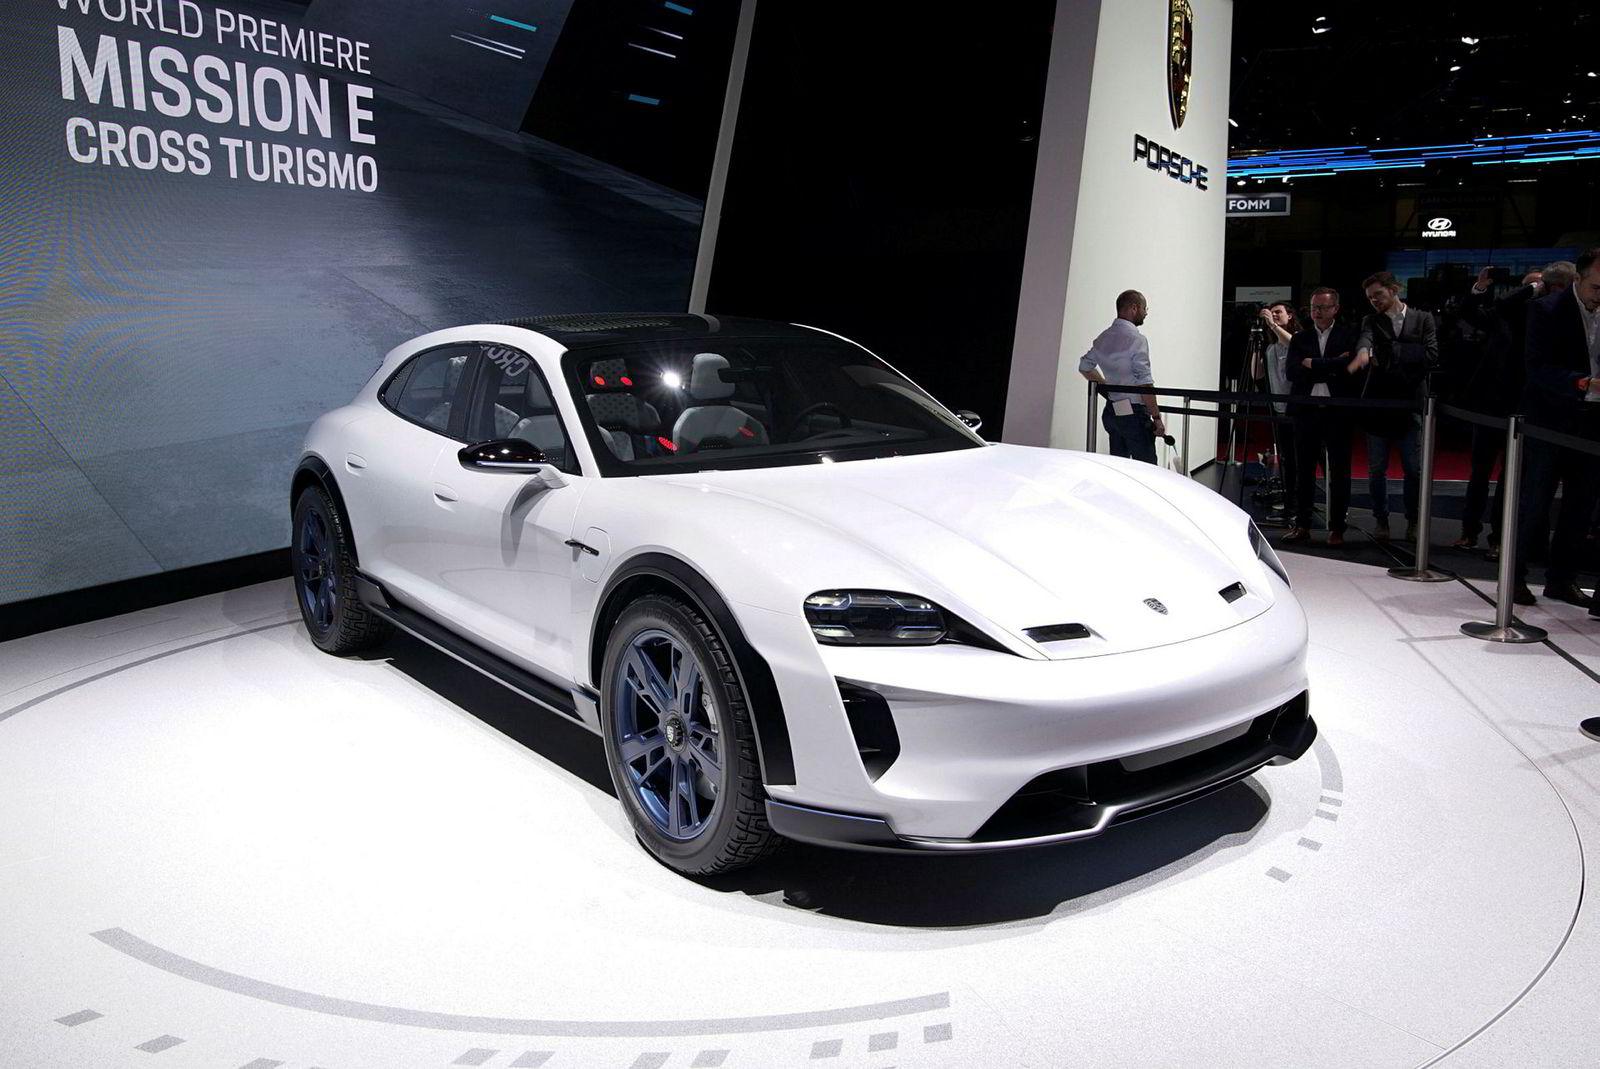 Porsche Mission E Cross Turismo i Genève 2018.